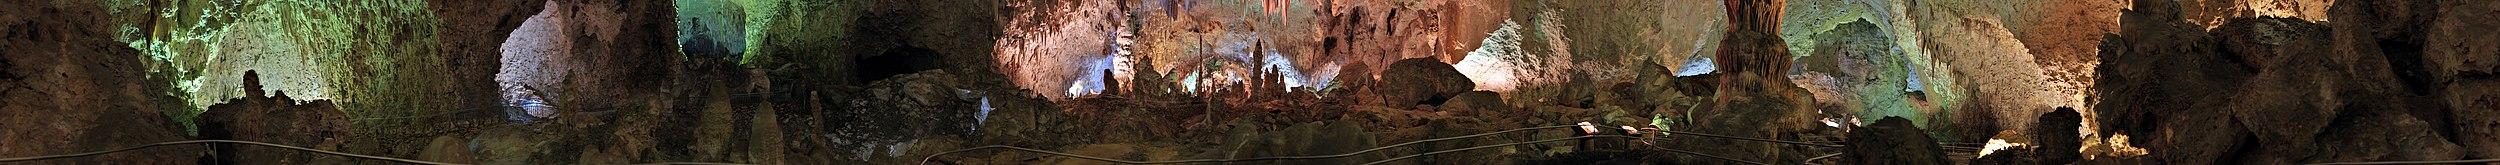 202 - Grotte de Carlsbad - Février 2010.jpg